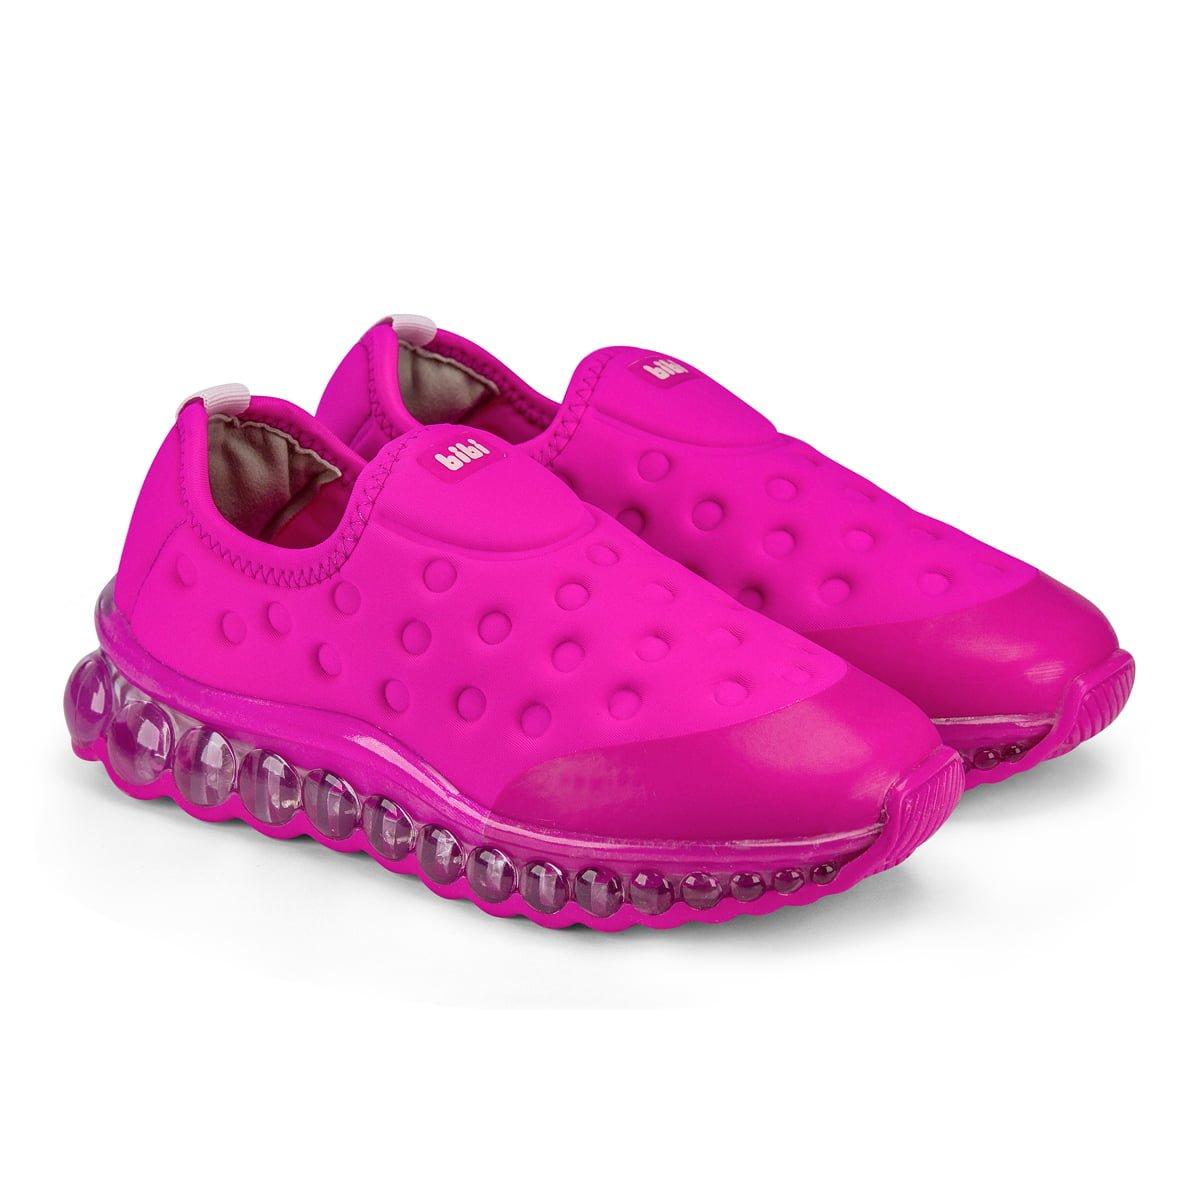 Pantofi sport Bibi Shoes Led Roller Celebration, Roz imagine